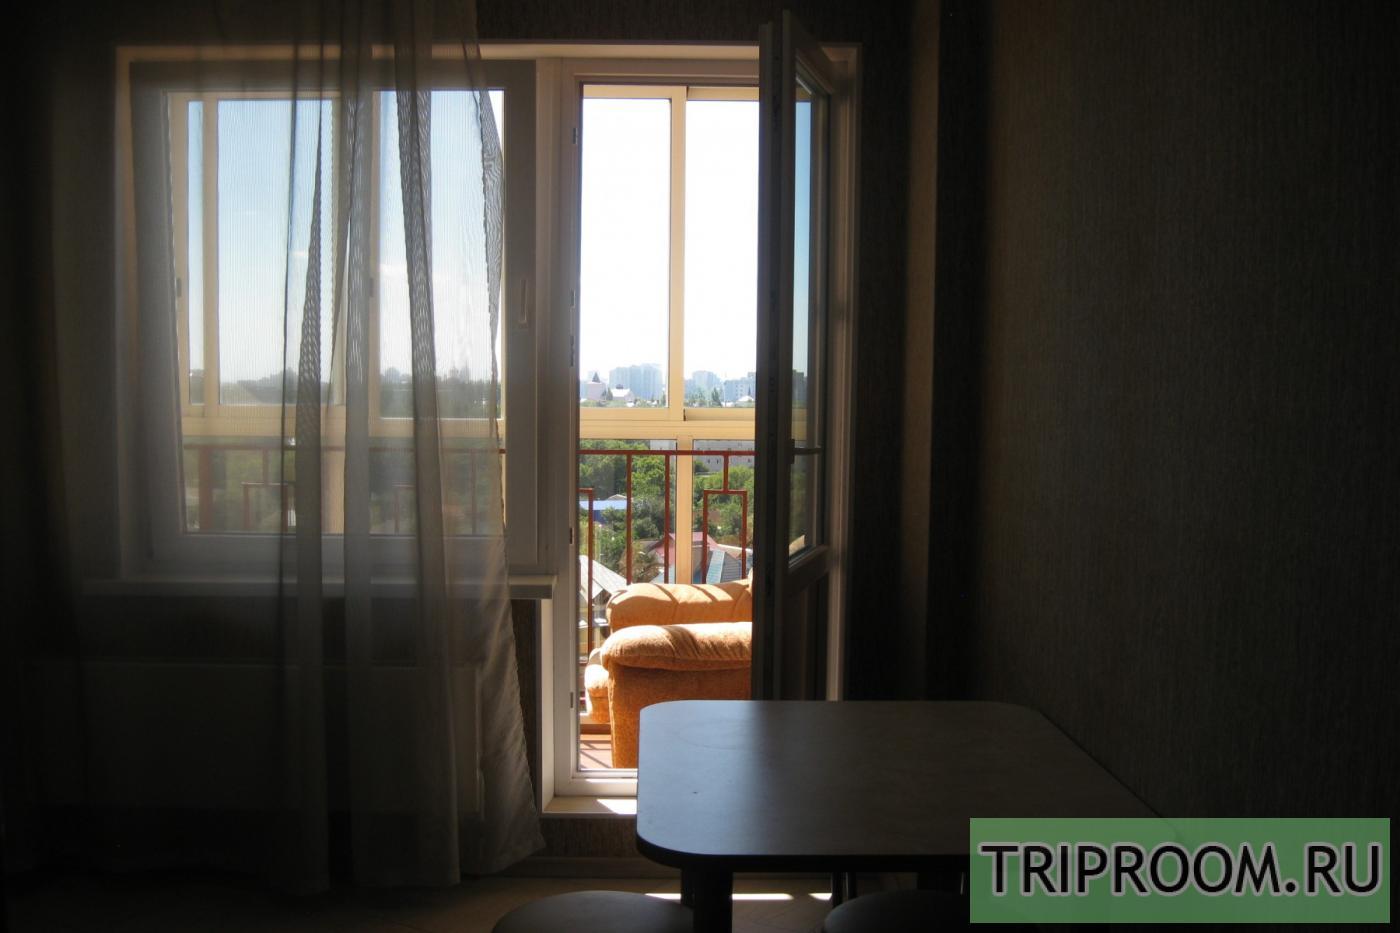 1-комнатная квартира посуточно (вариант № 22849), ул. Шишкова улица, фото № 4